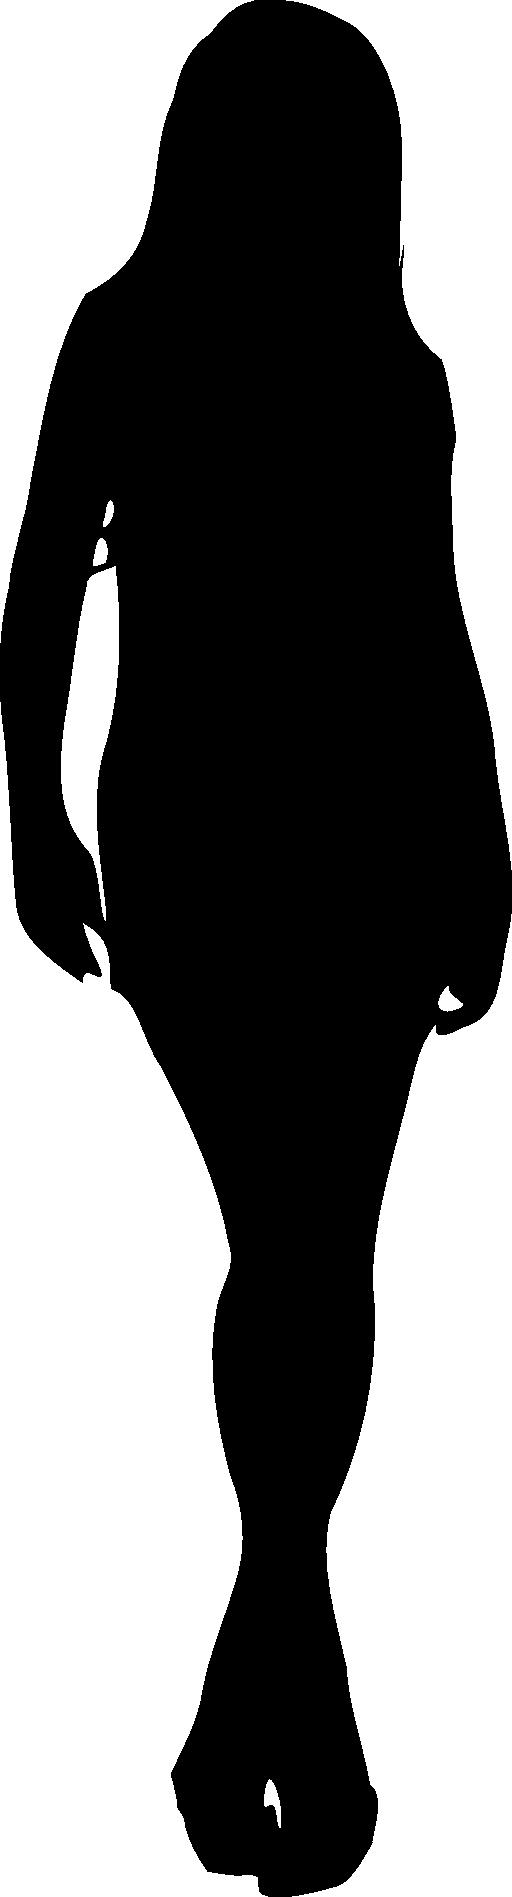 512x1897 Pregnant Woman Silhouette Clip Art